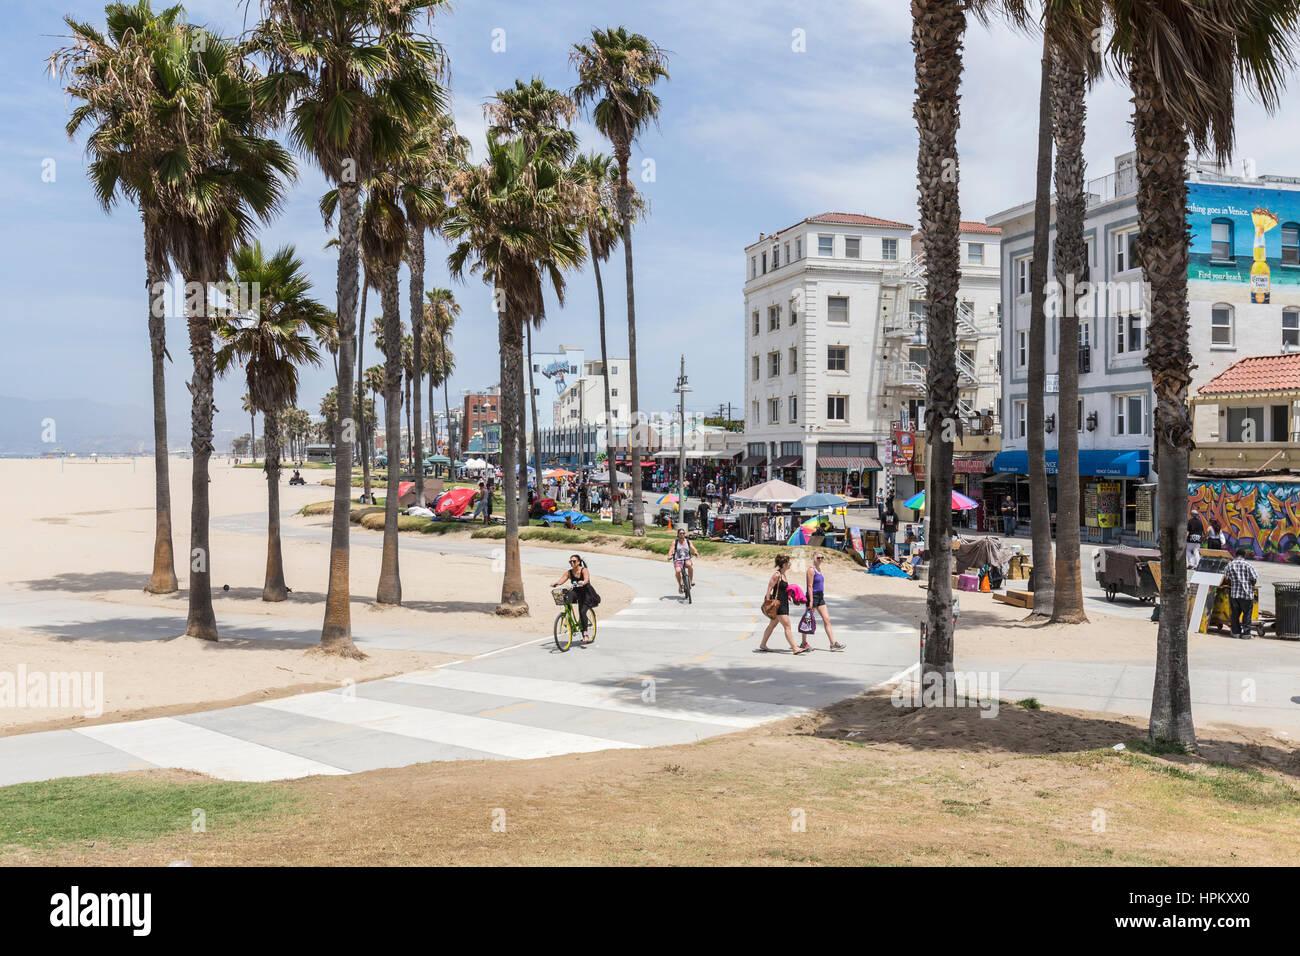 Editorial View Of The Venice Beach Boardwalk Bike Path In Los